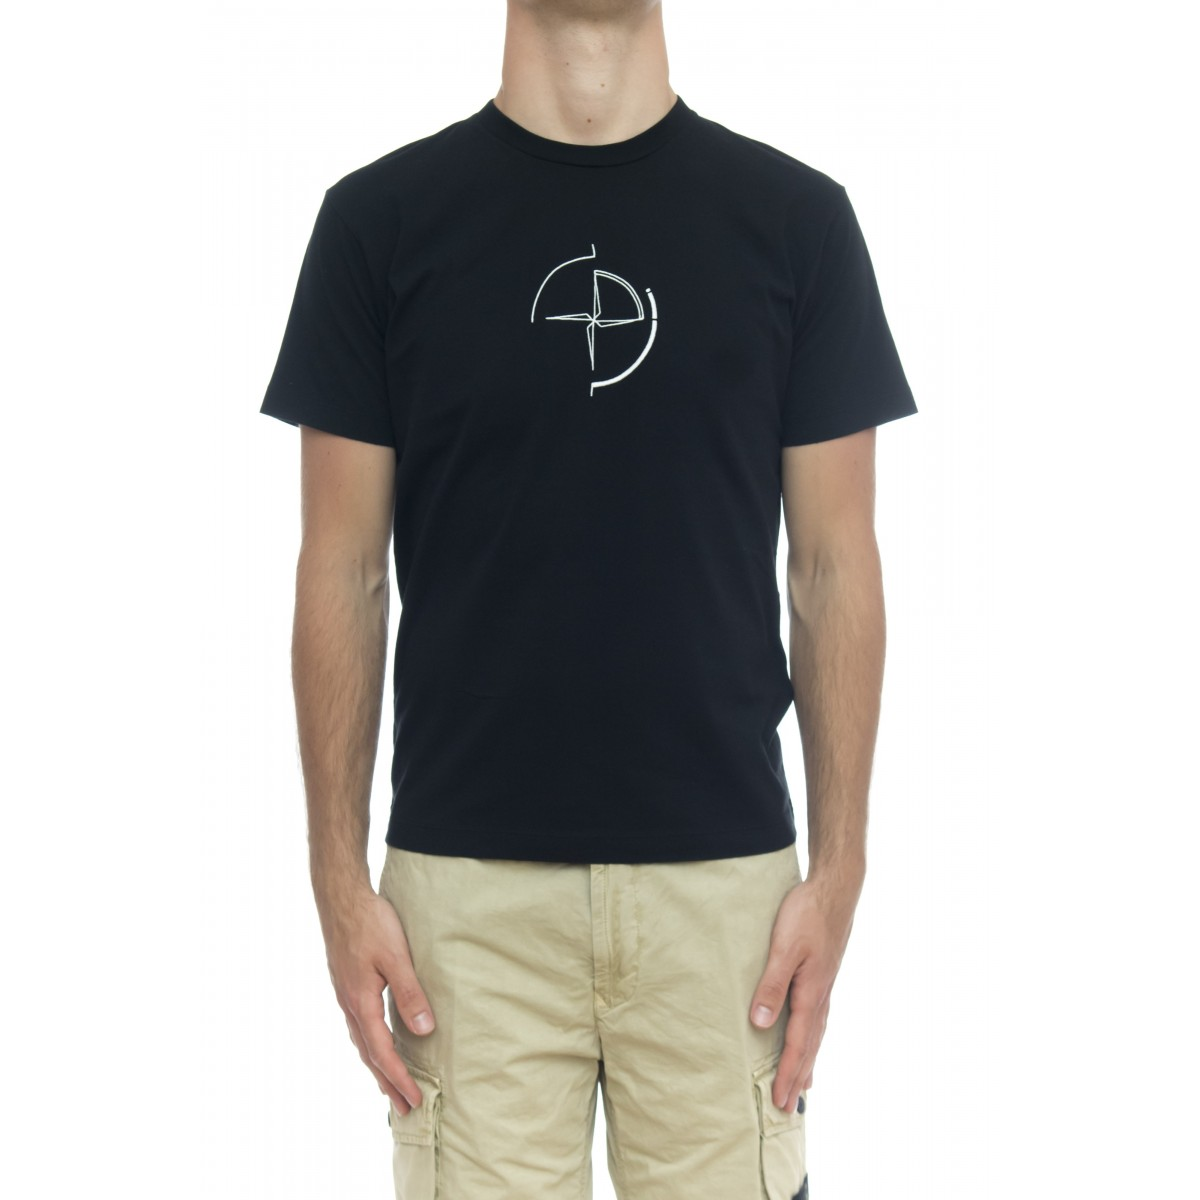 T-shirt - 2ns89 t-shirt stampa